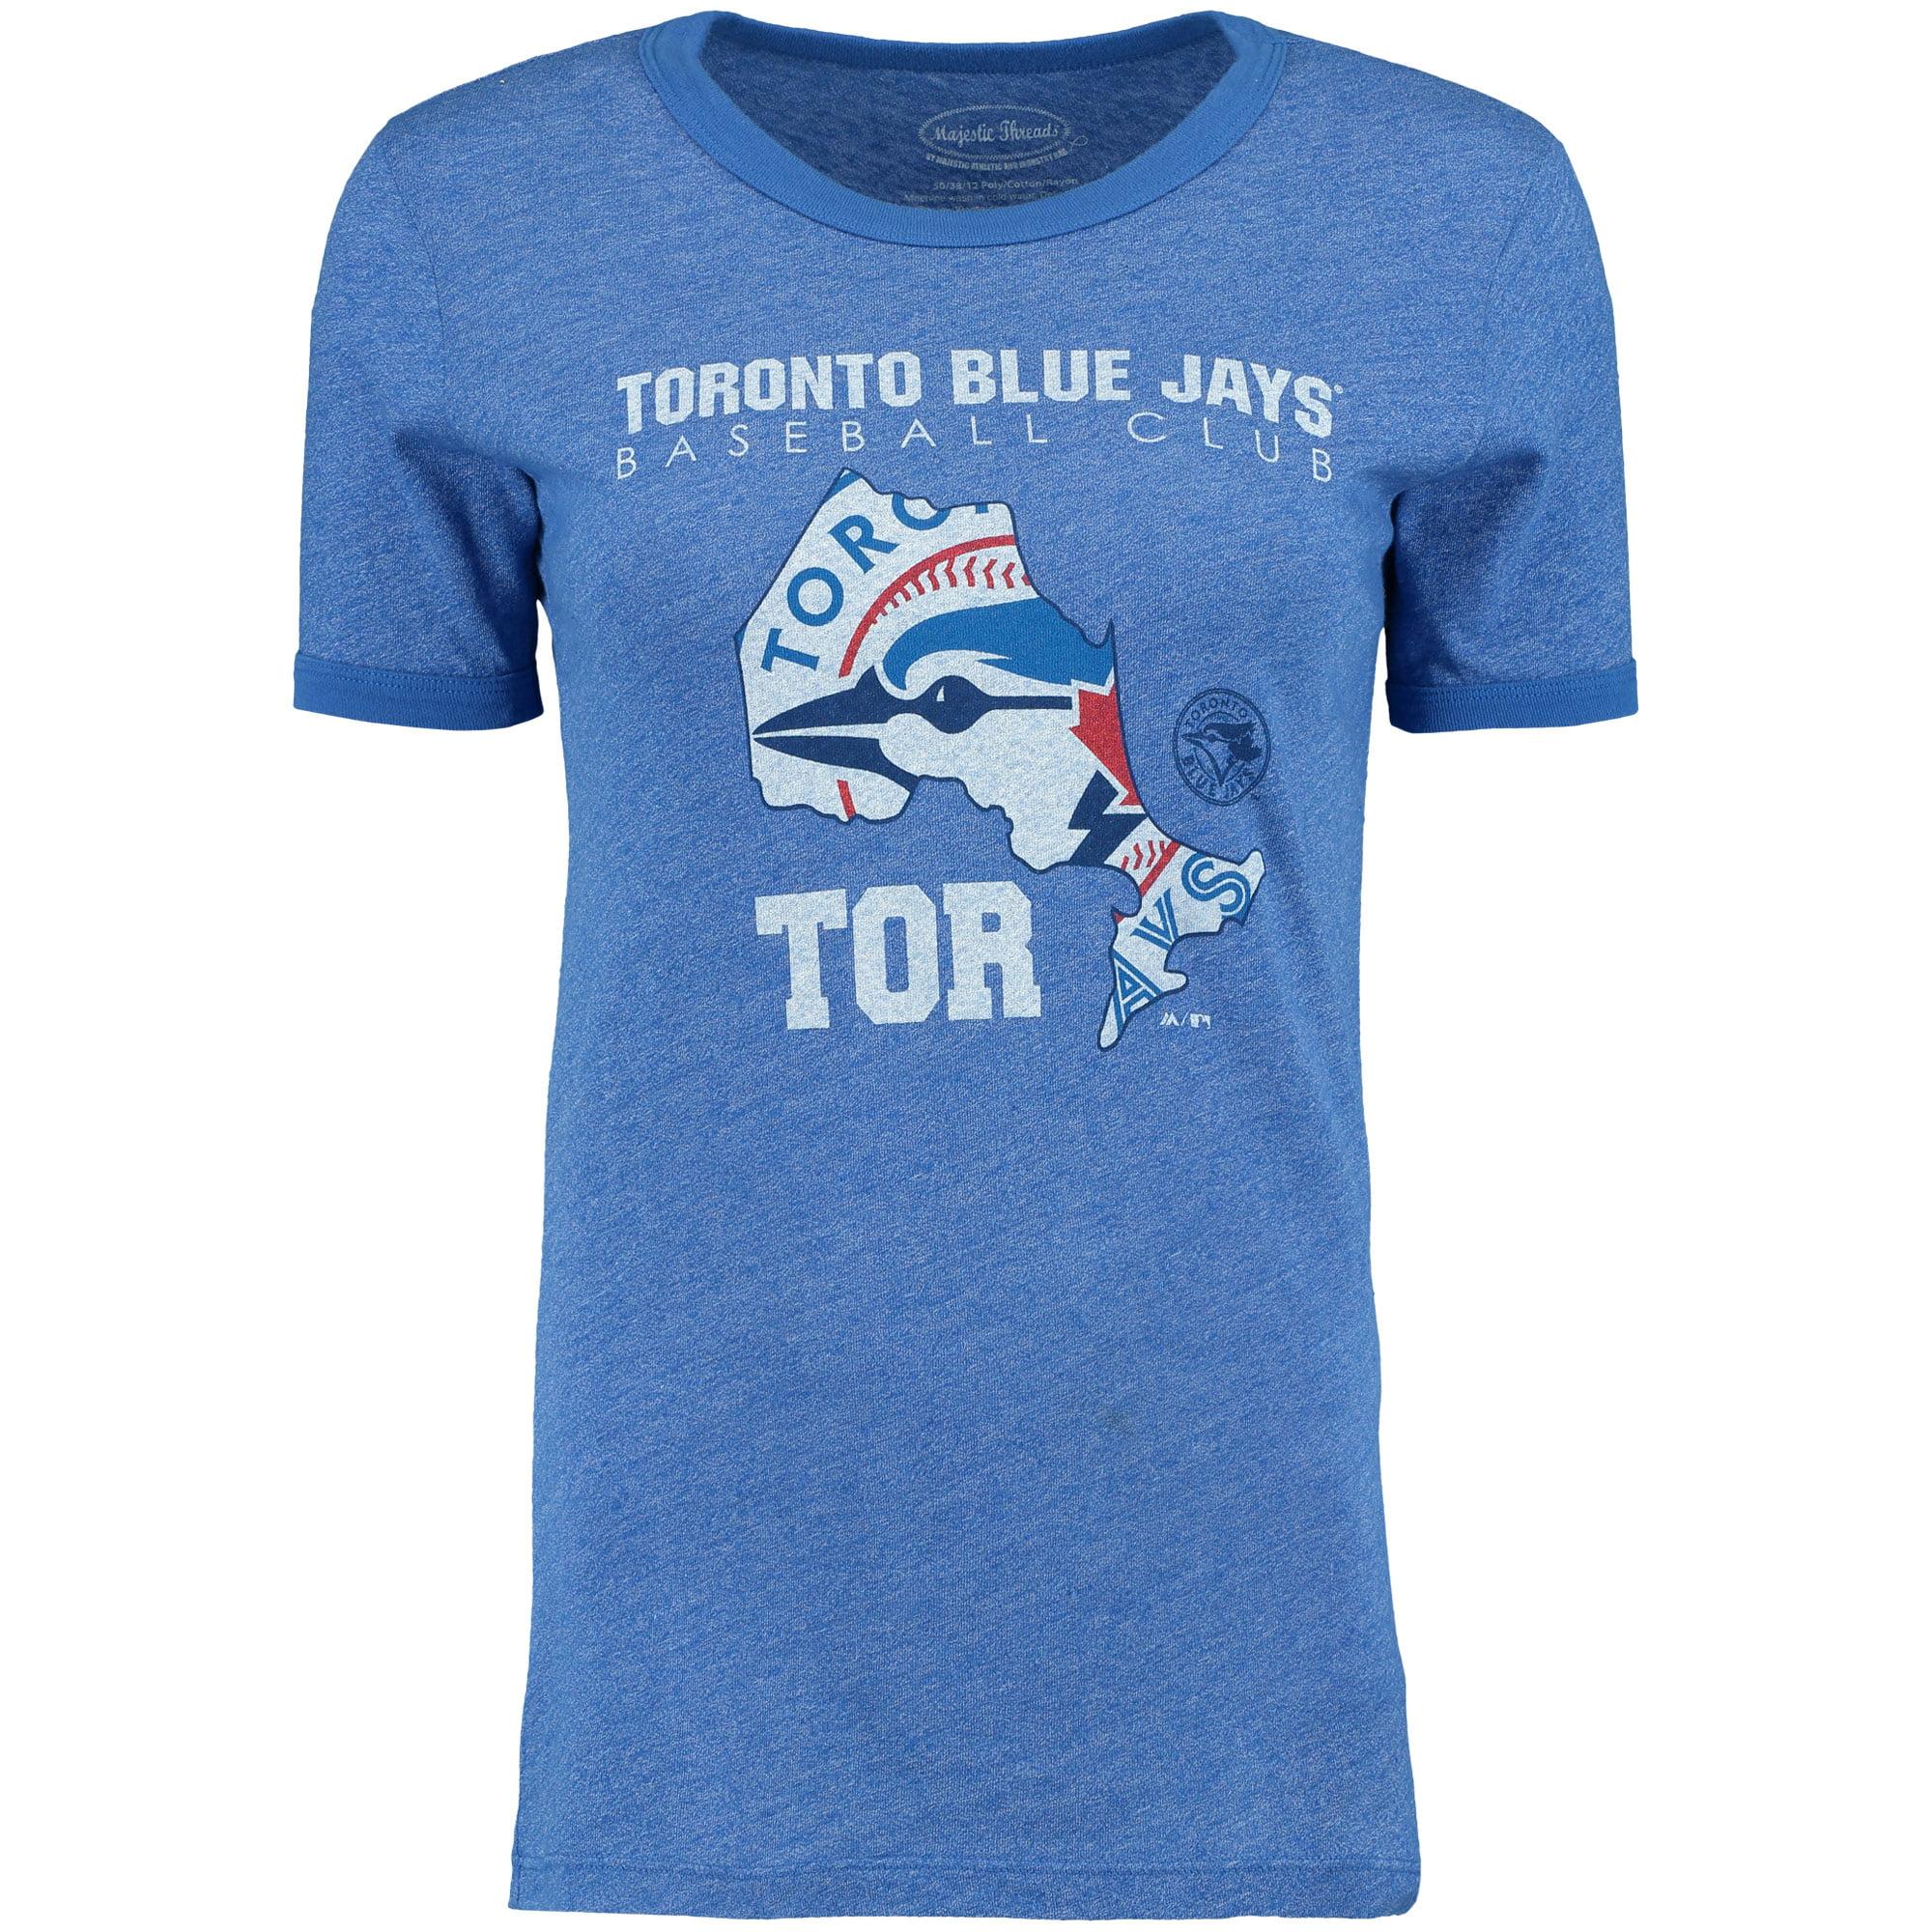 Toronto Blue Jays Majestic Threads Women's State Sport T-Shirt - Royal